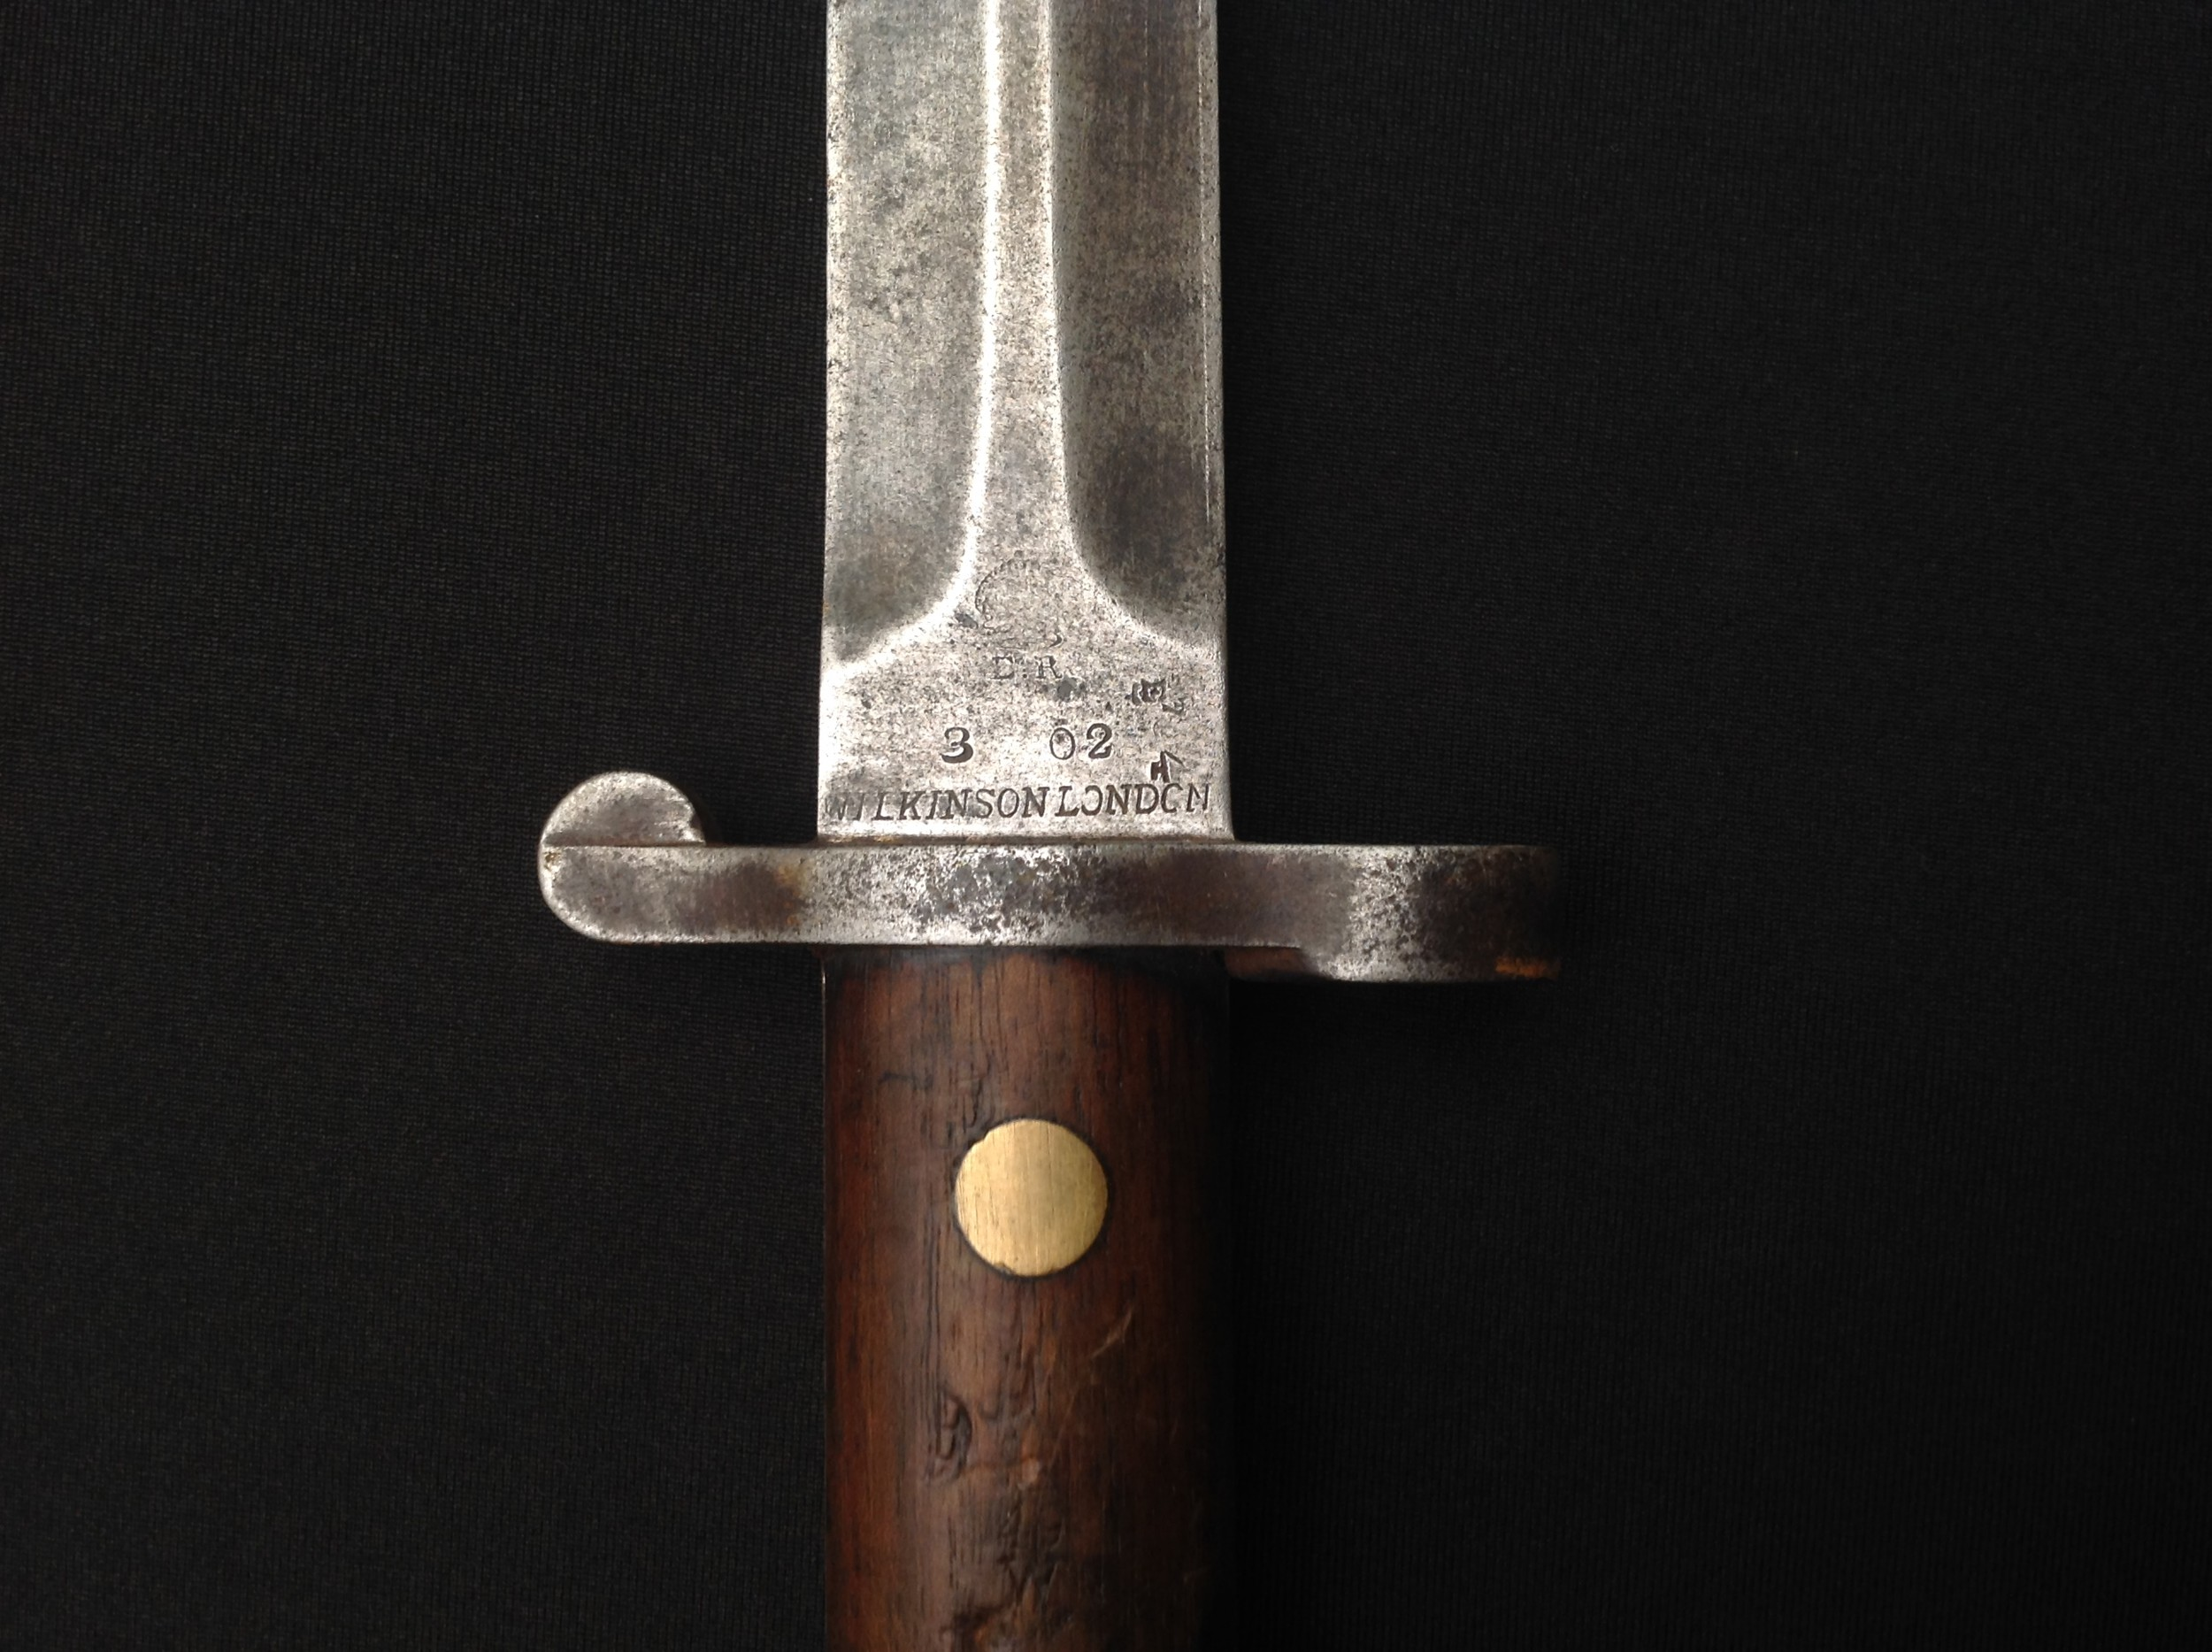 British 1888 pattern Lee-Metford bayonet by Wilkinson, London, 30.5cm blade marked 3 02, two-piece - Image 14 of 18